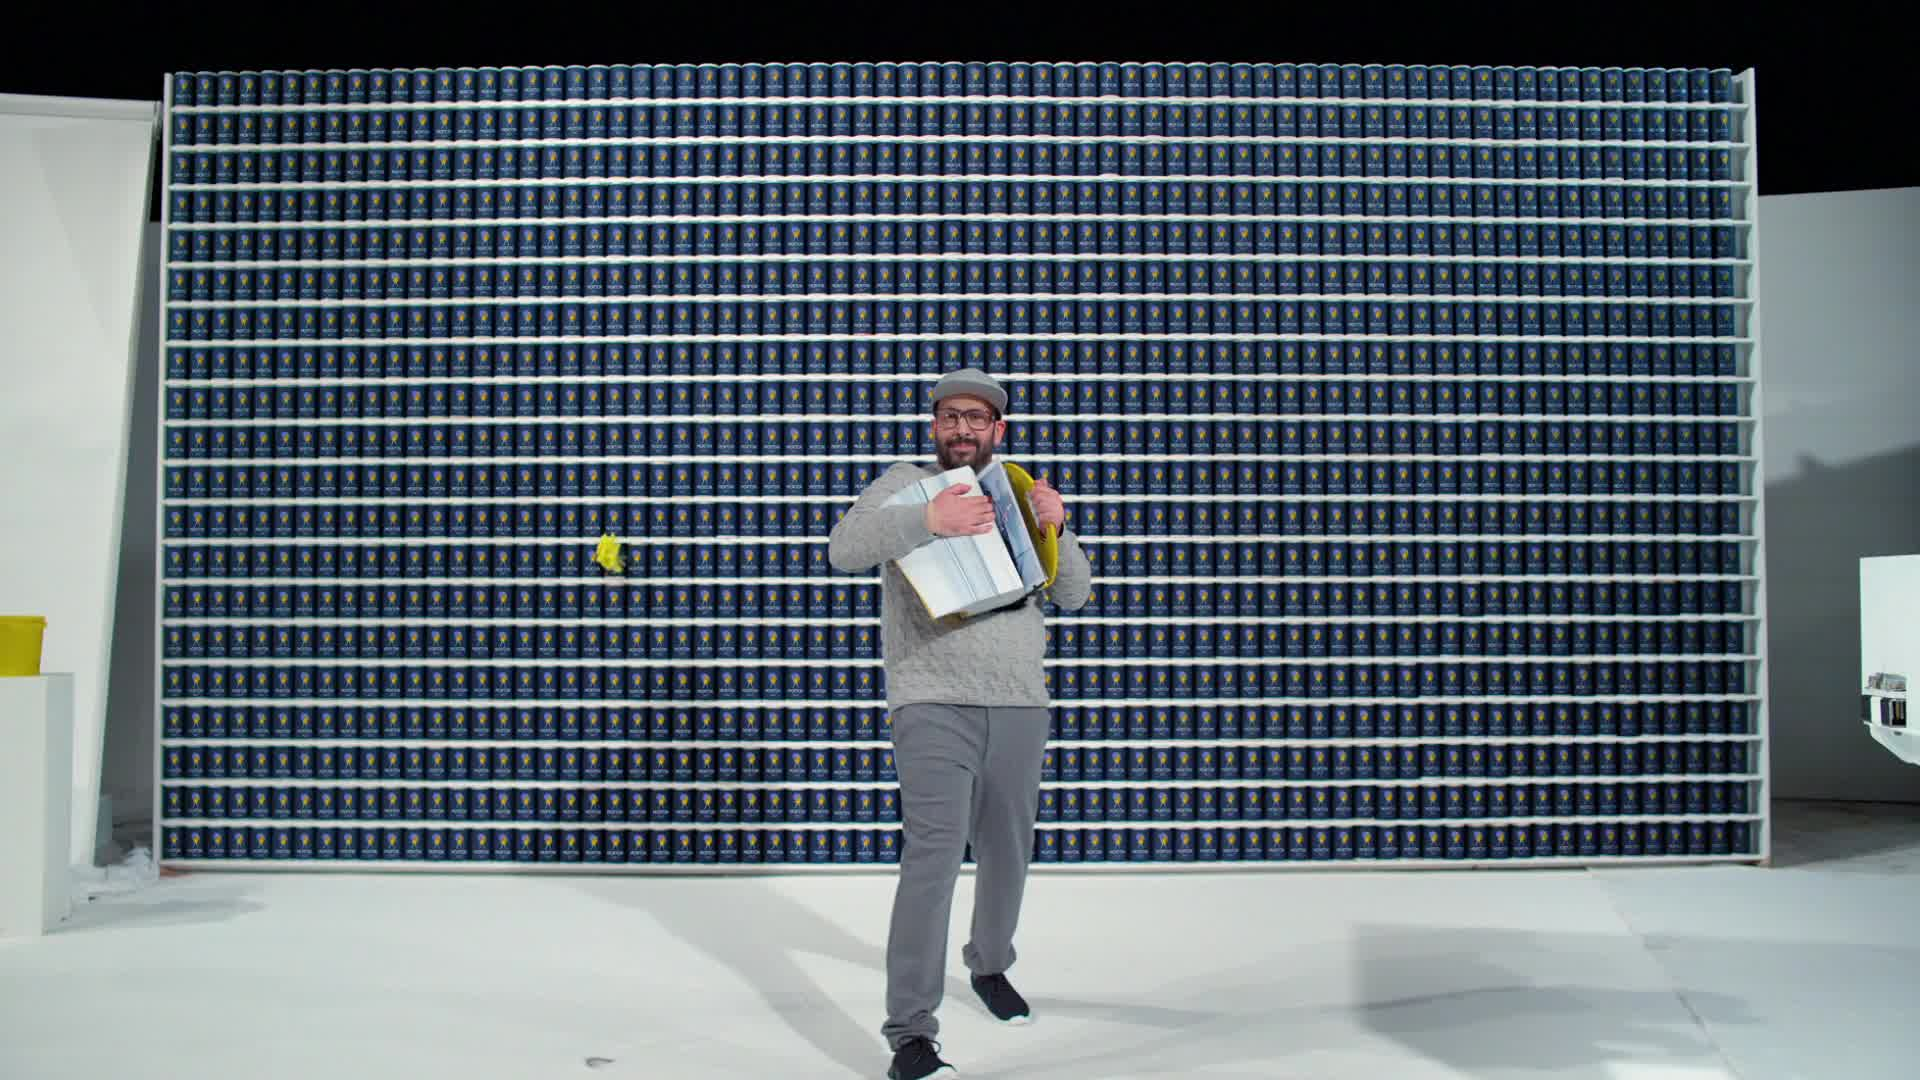 OK Go, The One Moment, Tim Nordwind, moment, morton, music, okgo, one, theonemoment, Colors All Around Tim - OK Go GIFs